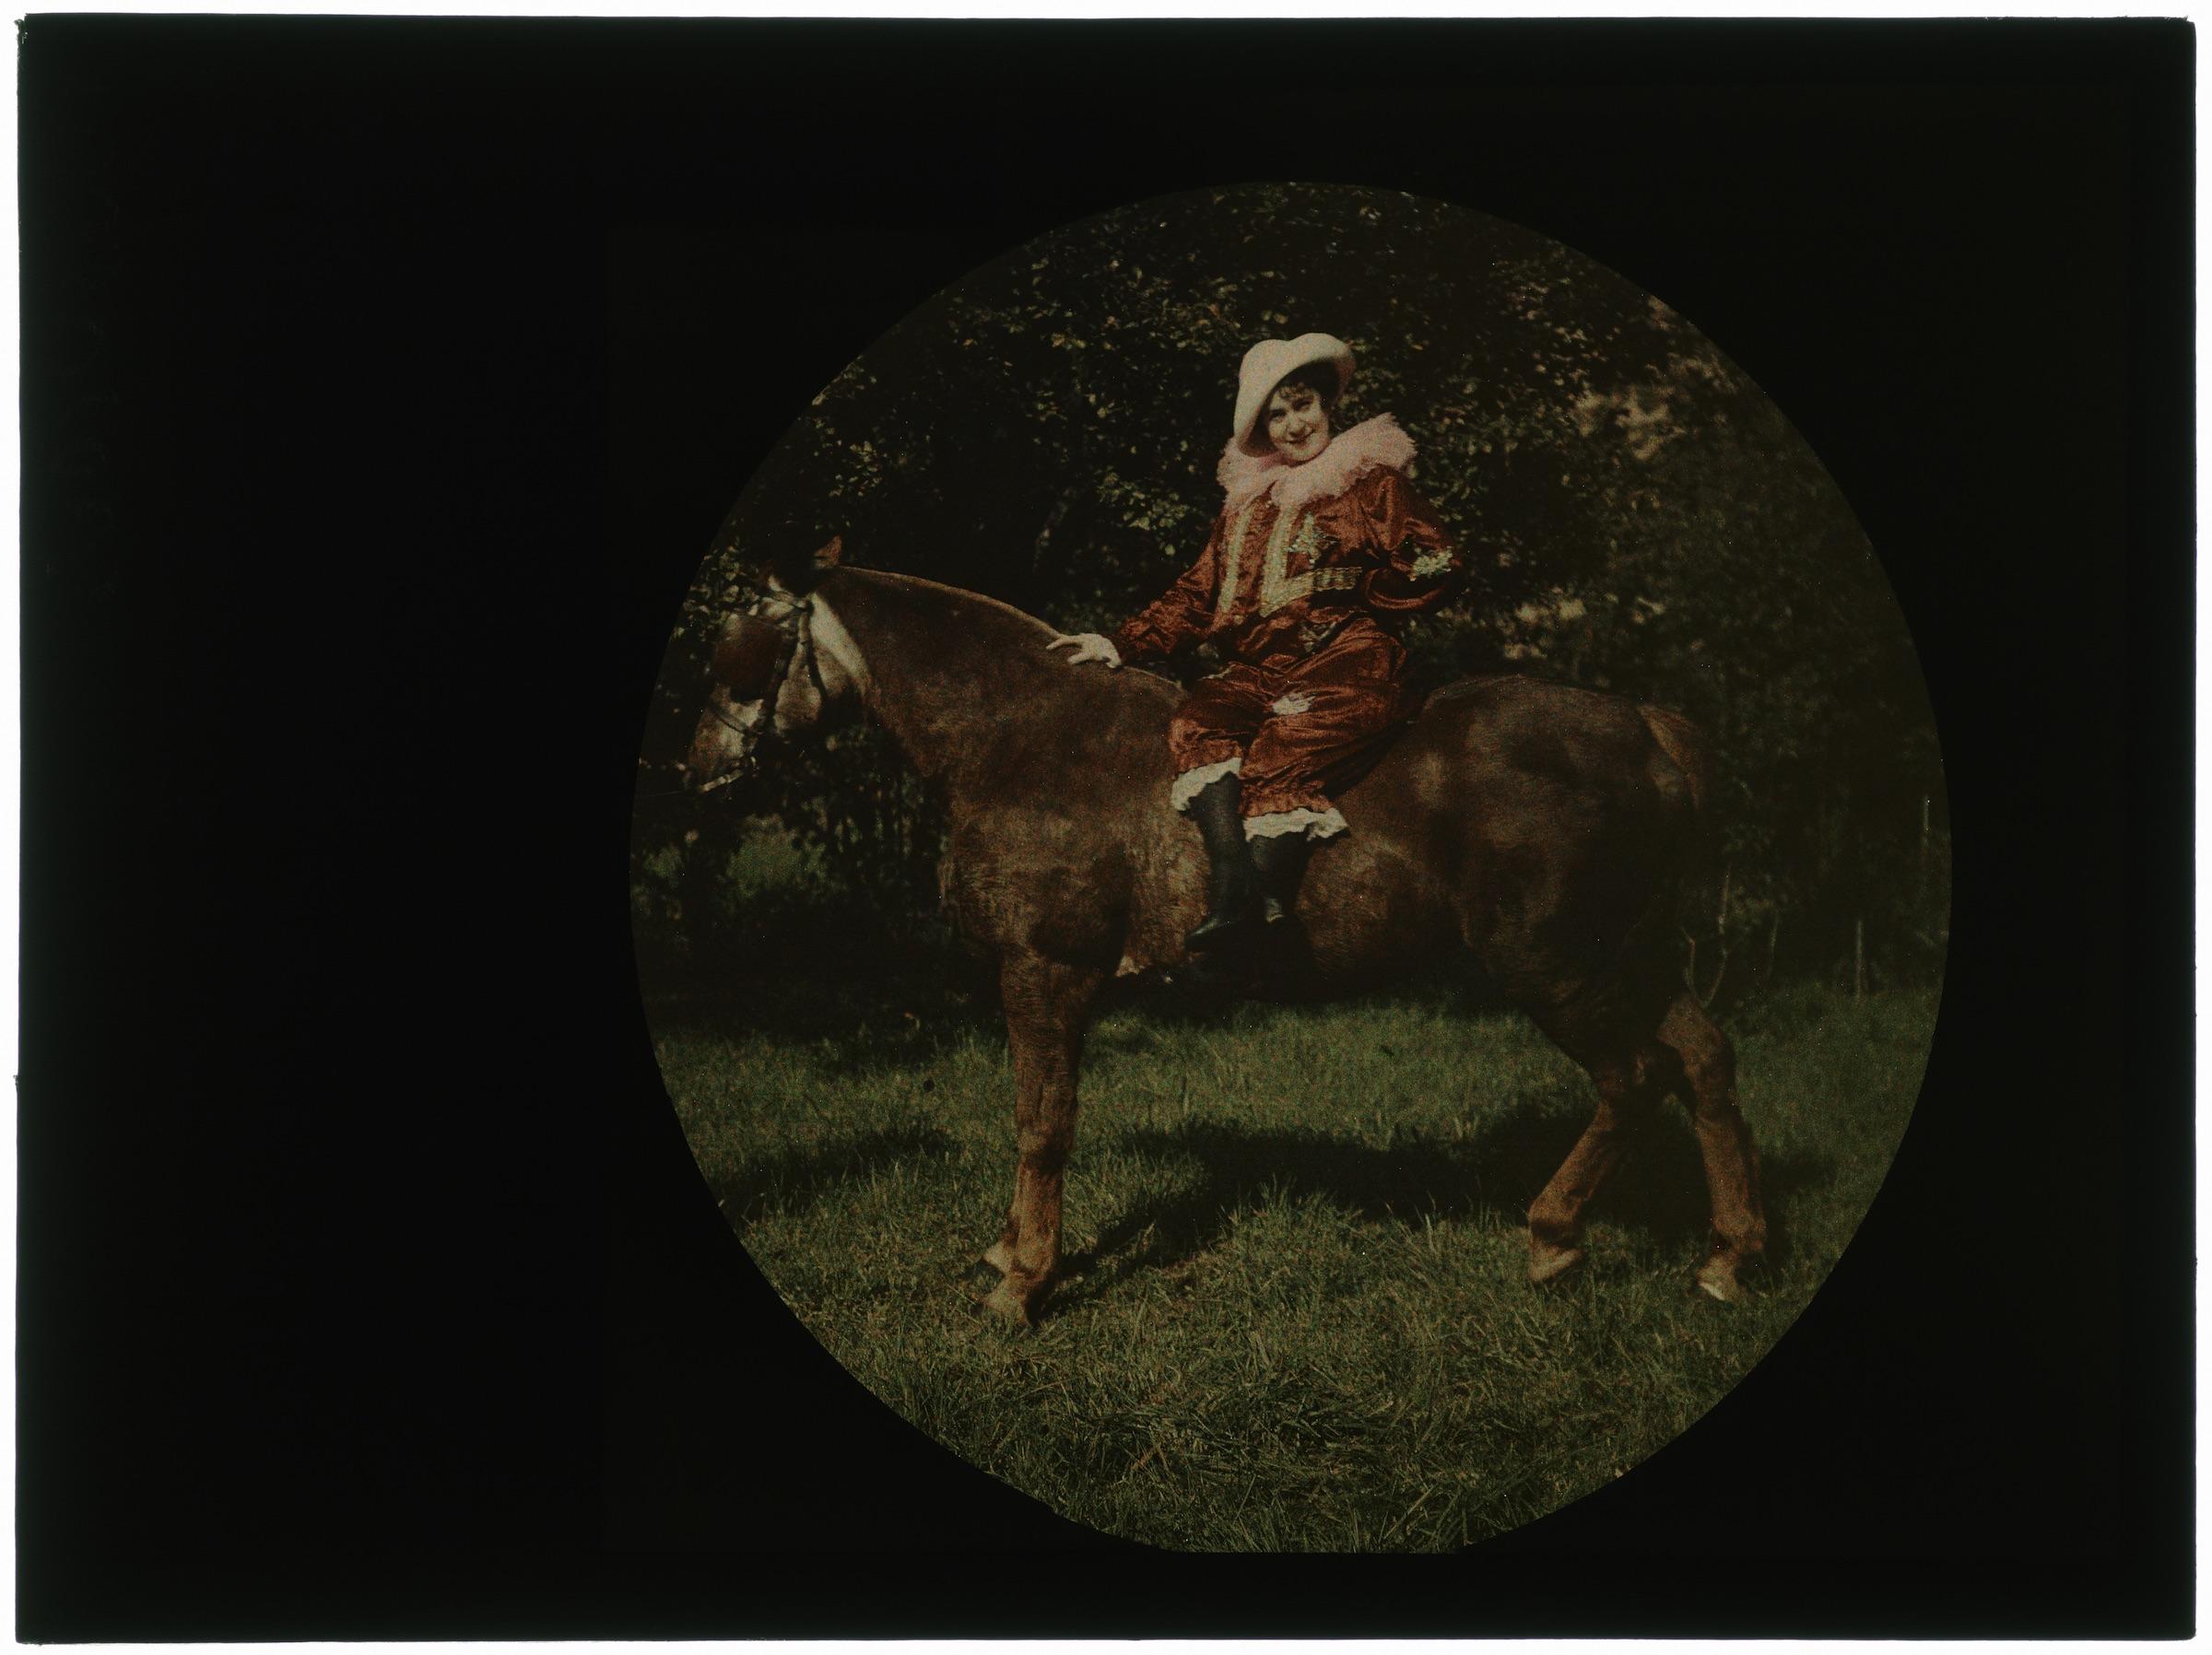 Cavalière en costume de cirque sur son cheval